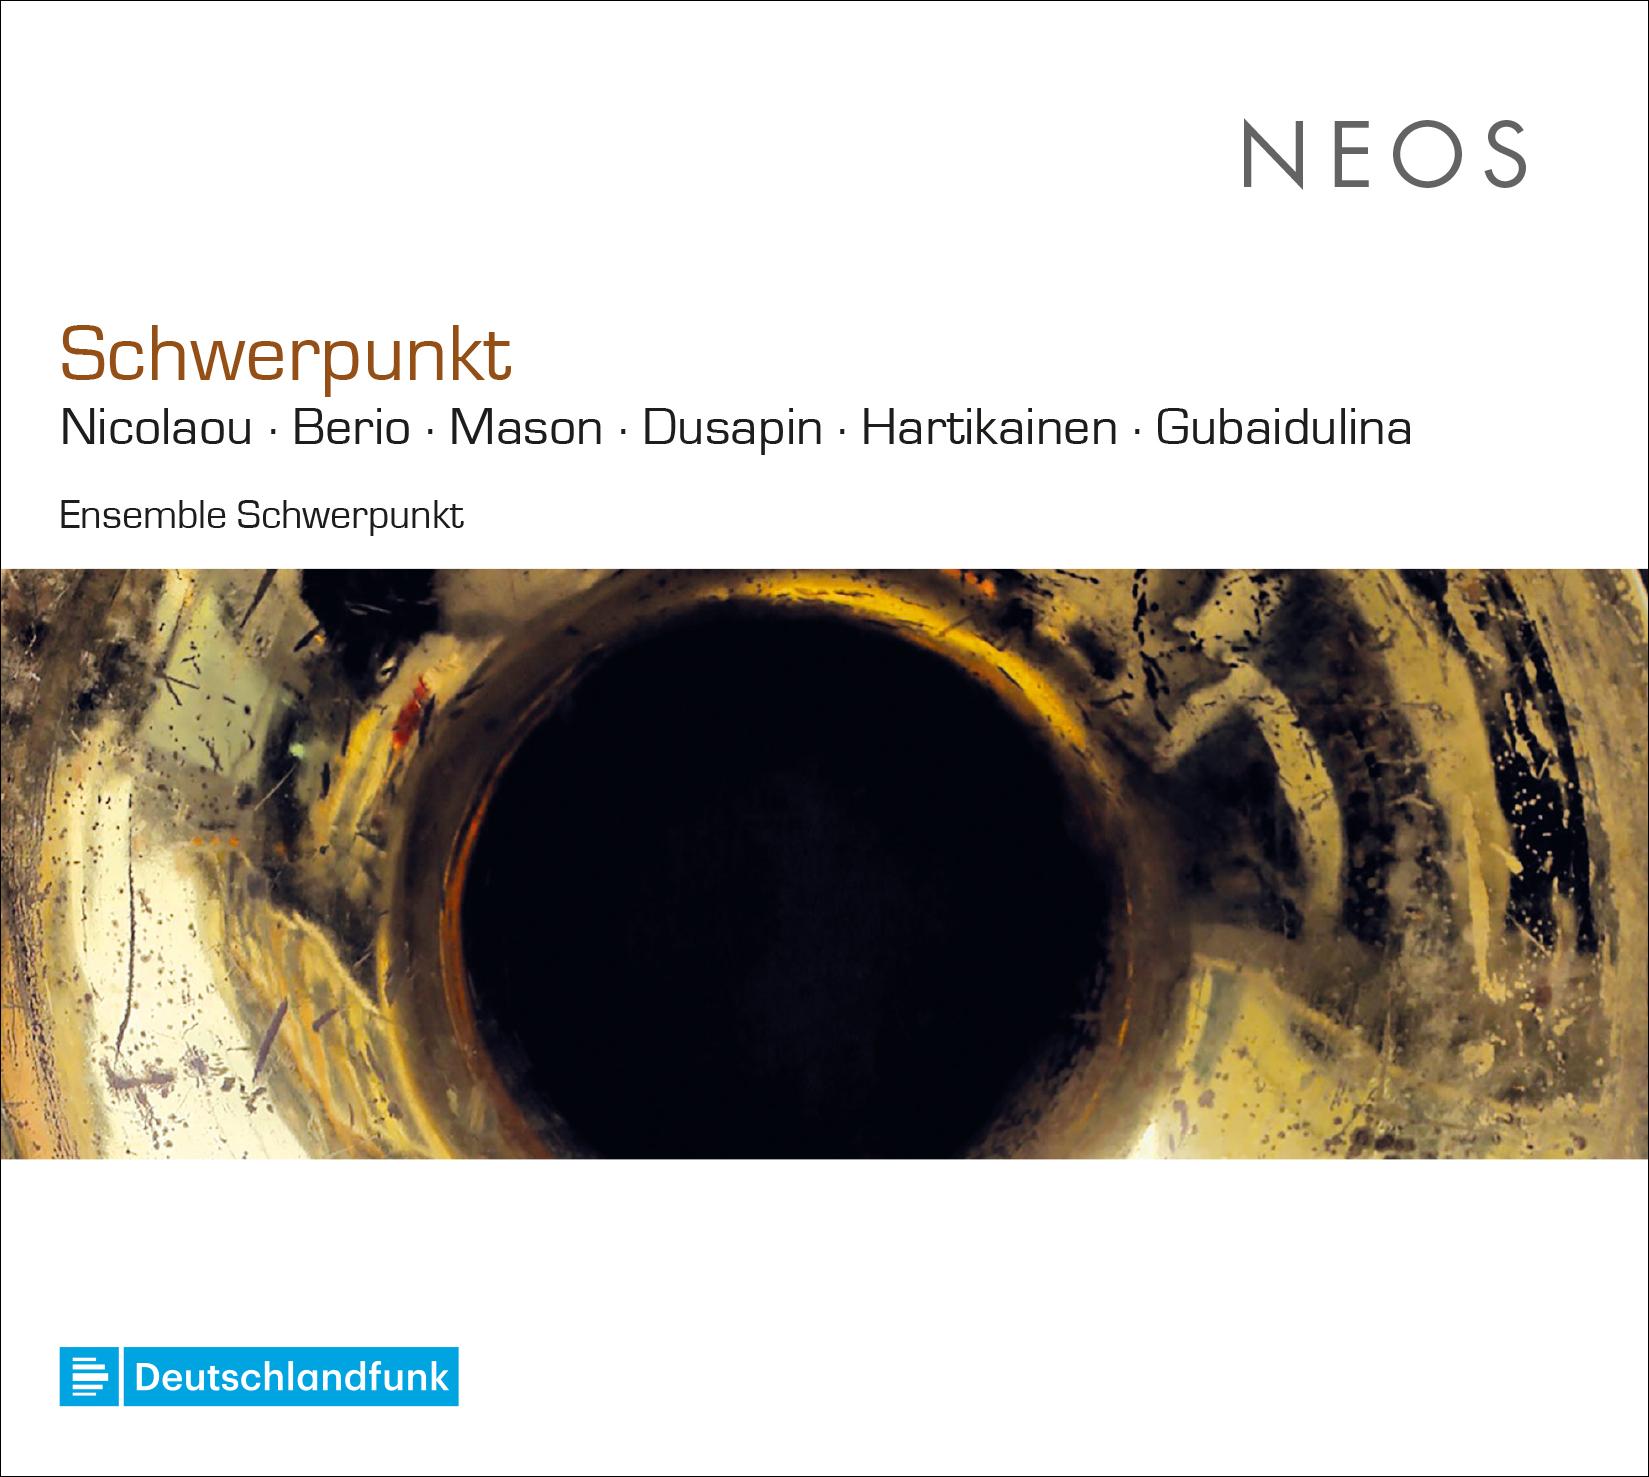 NEOS_Schwerpunkt.jpg